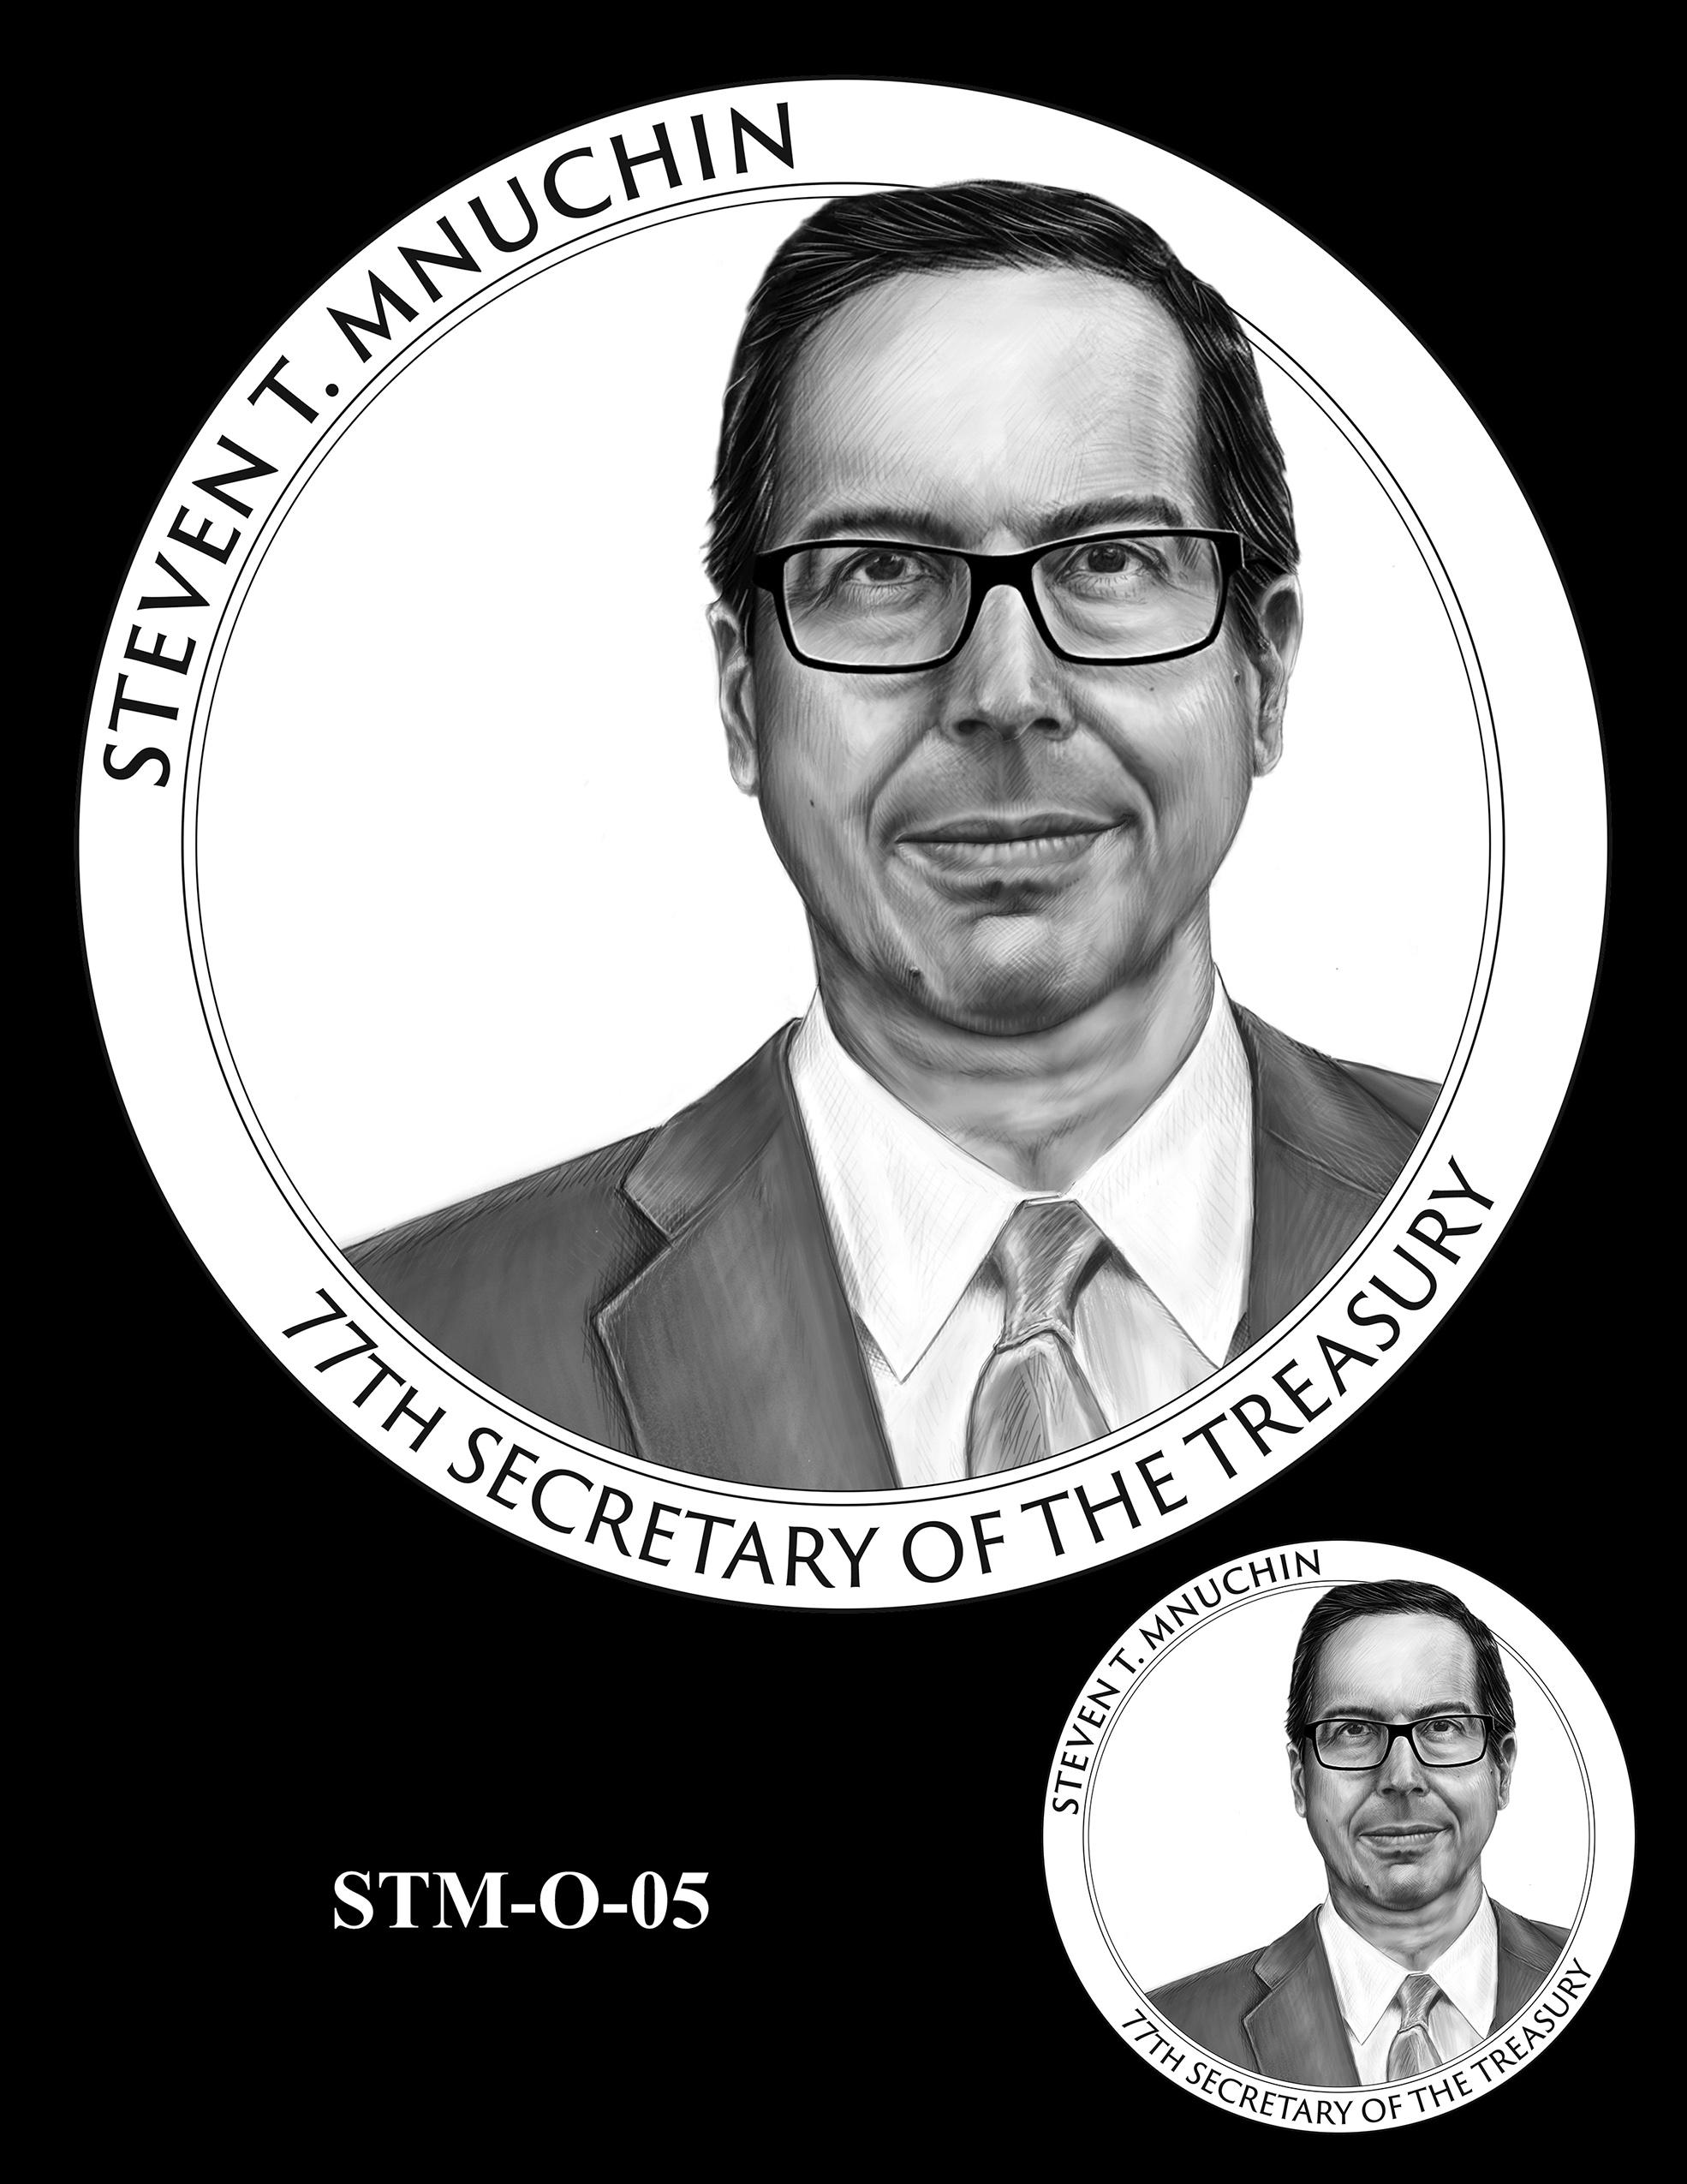 STM-O-05 -- Steven T. Mnuchin Secretary of the Treasury Medal